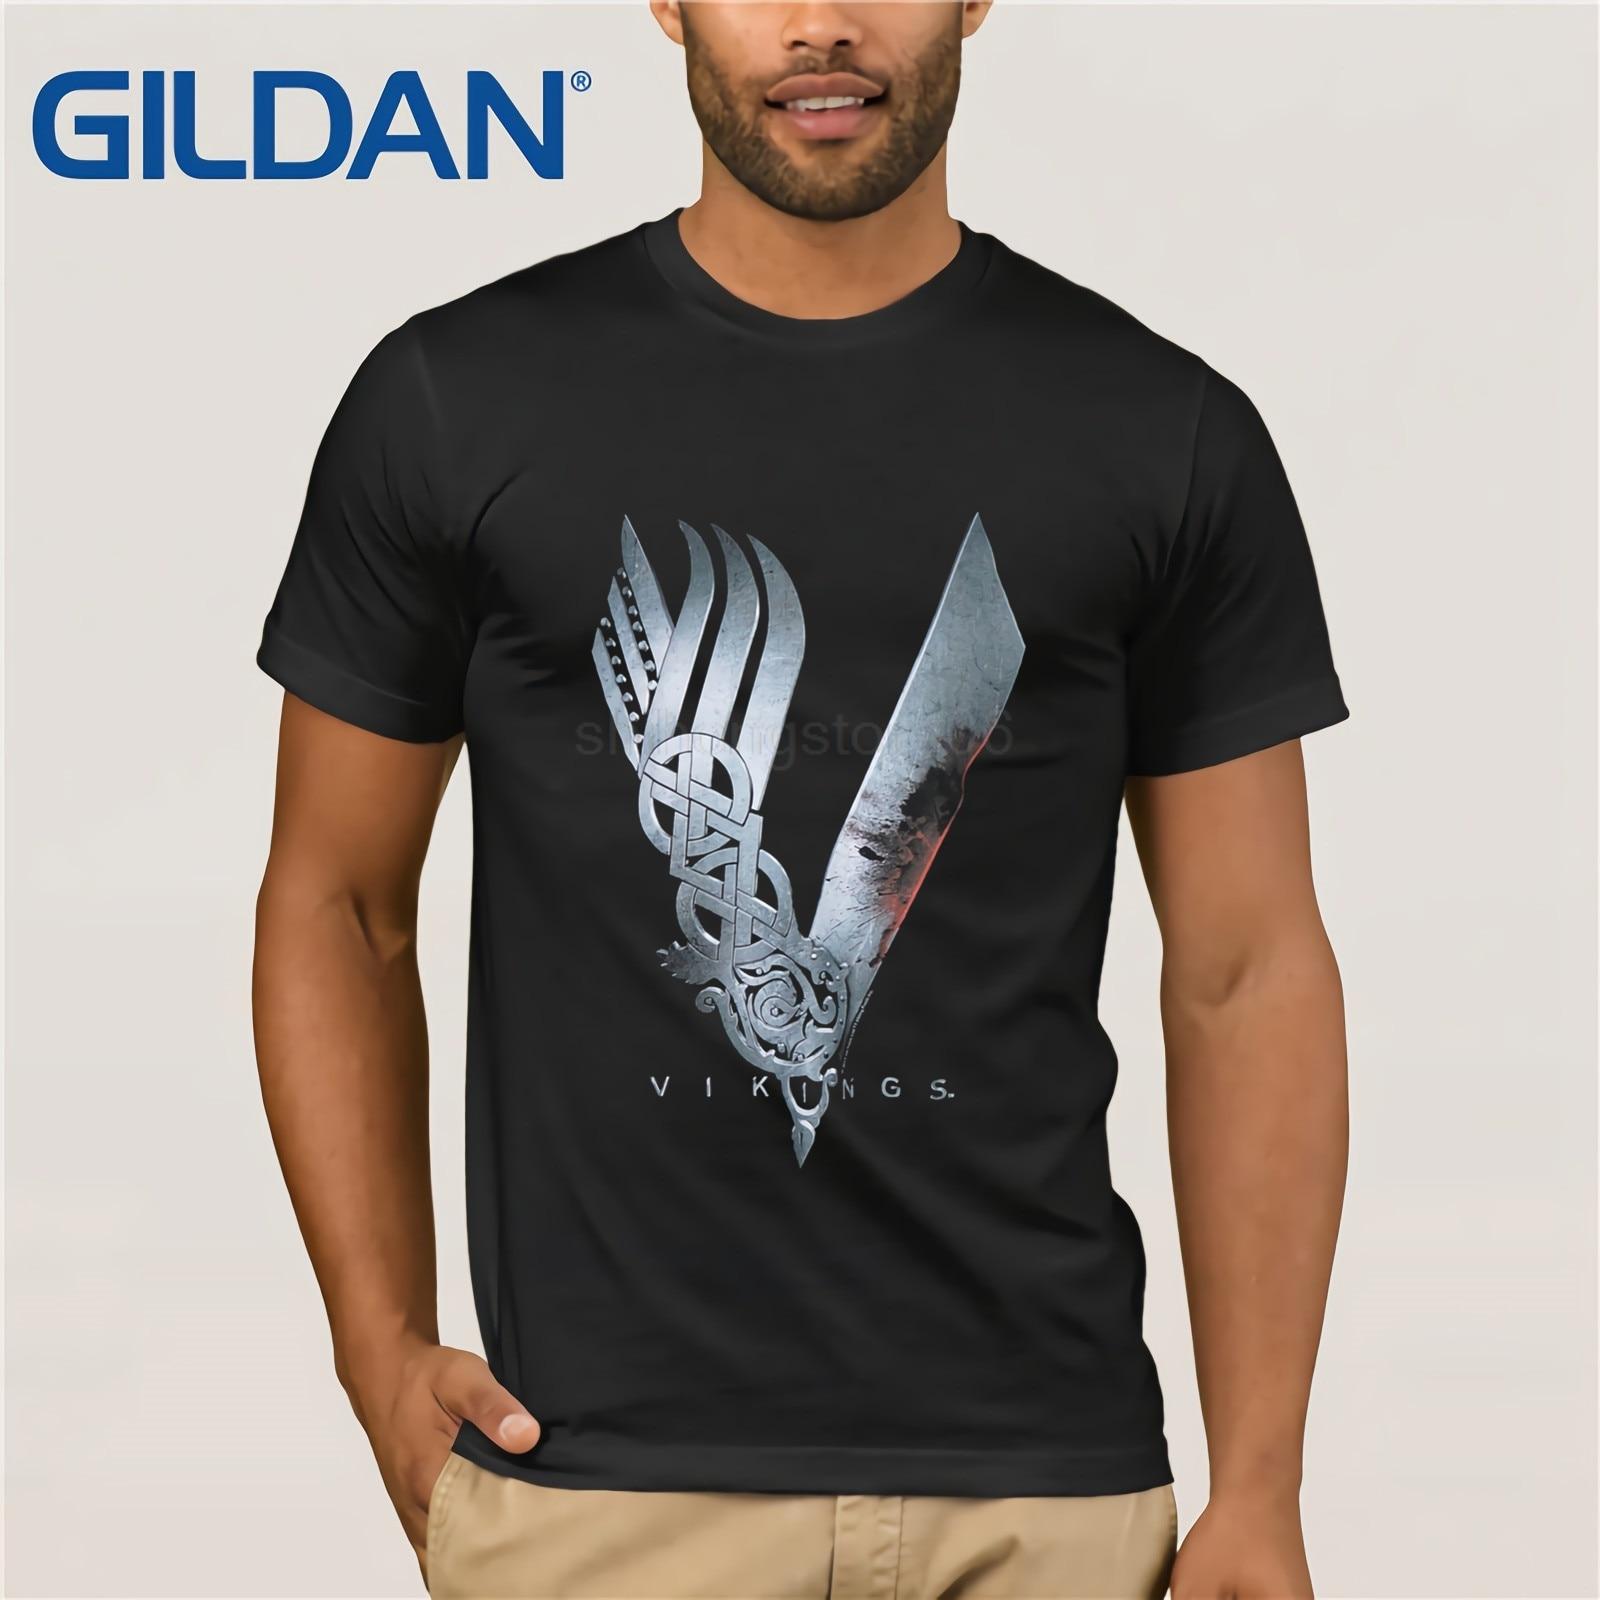 Aliexpress com : Buy Gildan New T Shirts Unisex Funny Tops Tee